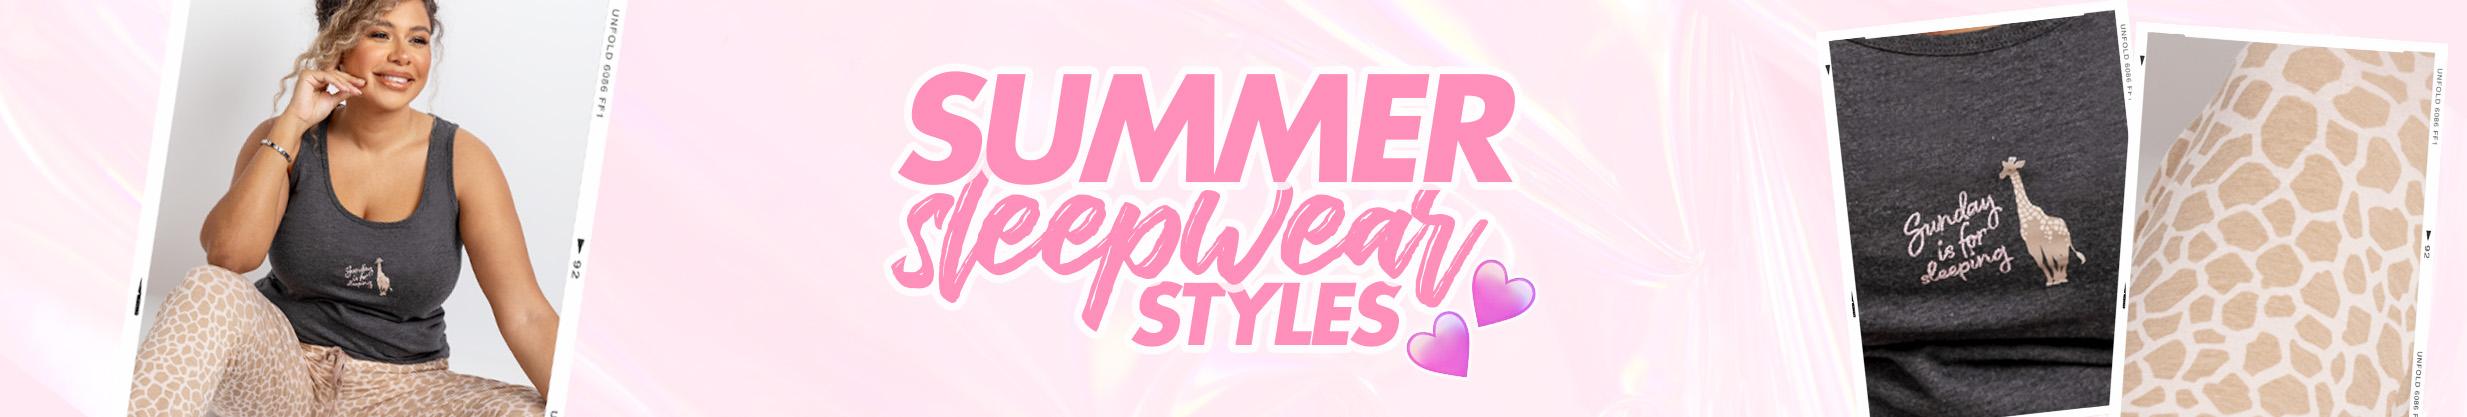 Summer night styles